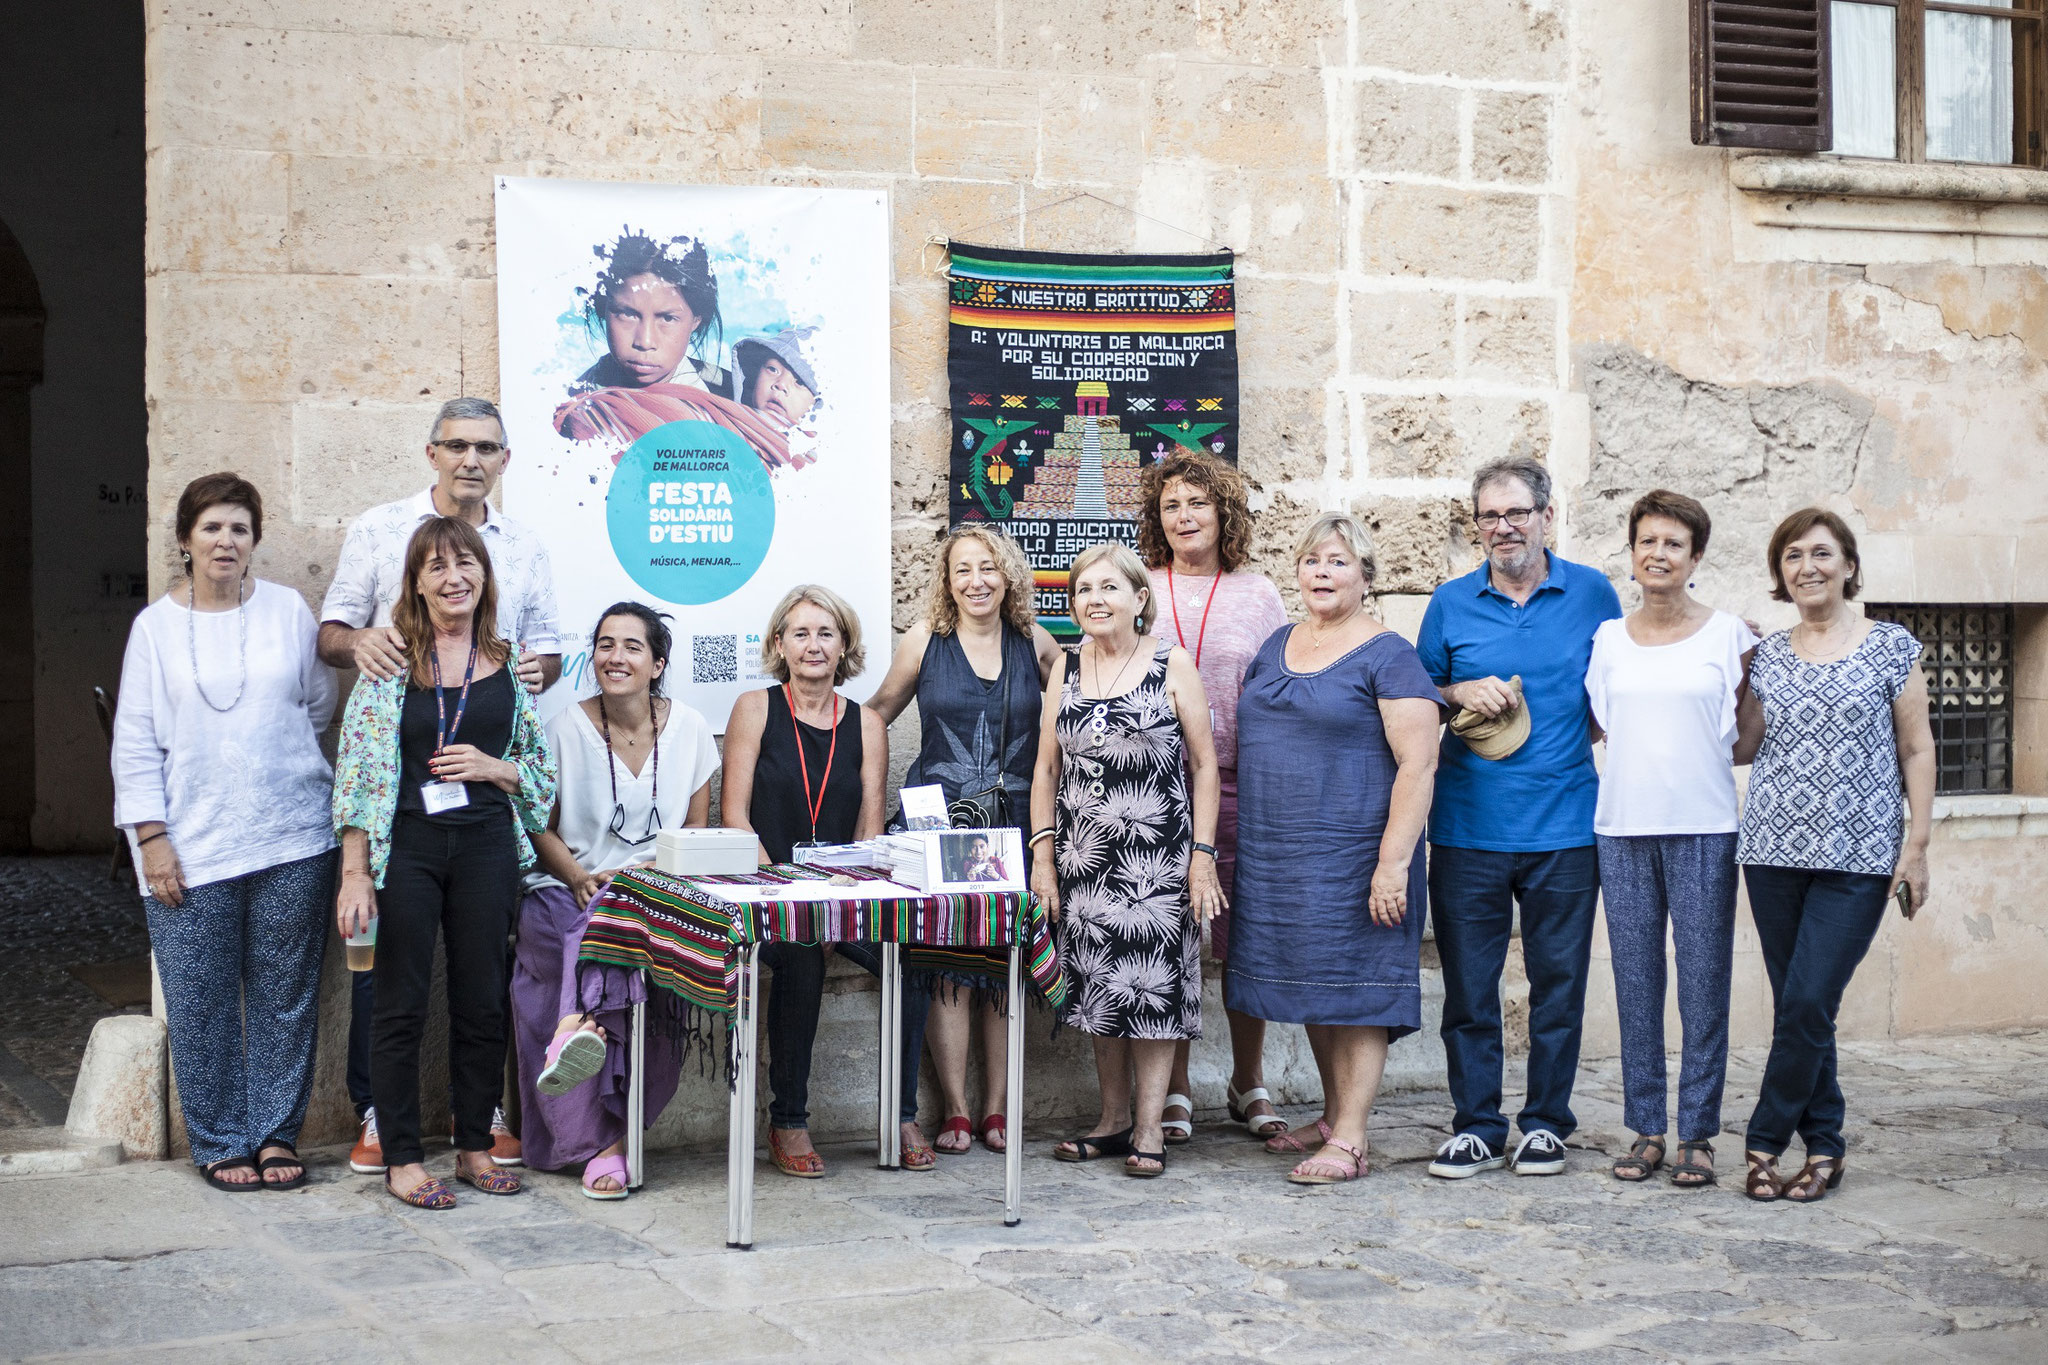 Fiesta solidaria de verano VdM 2017